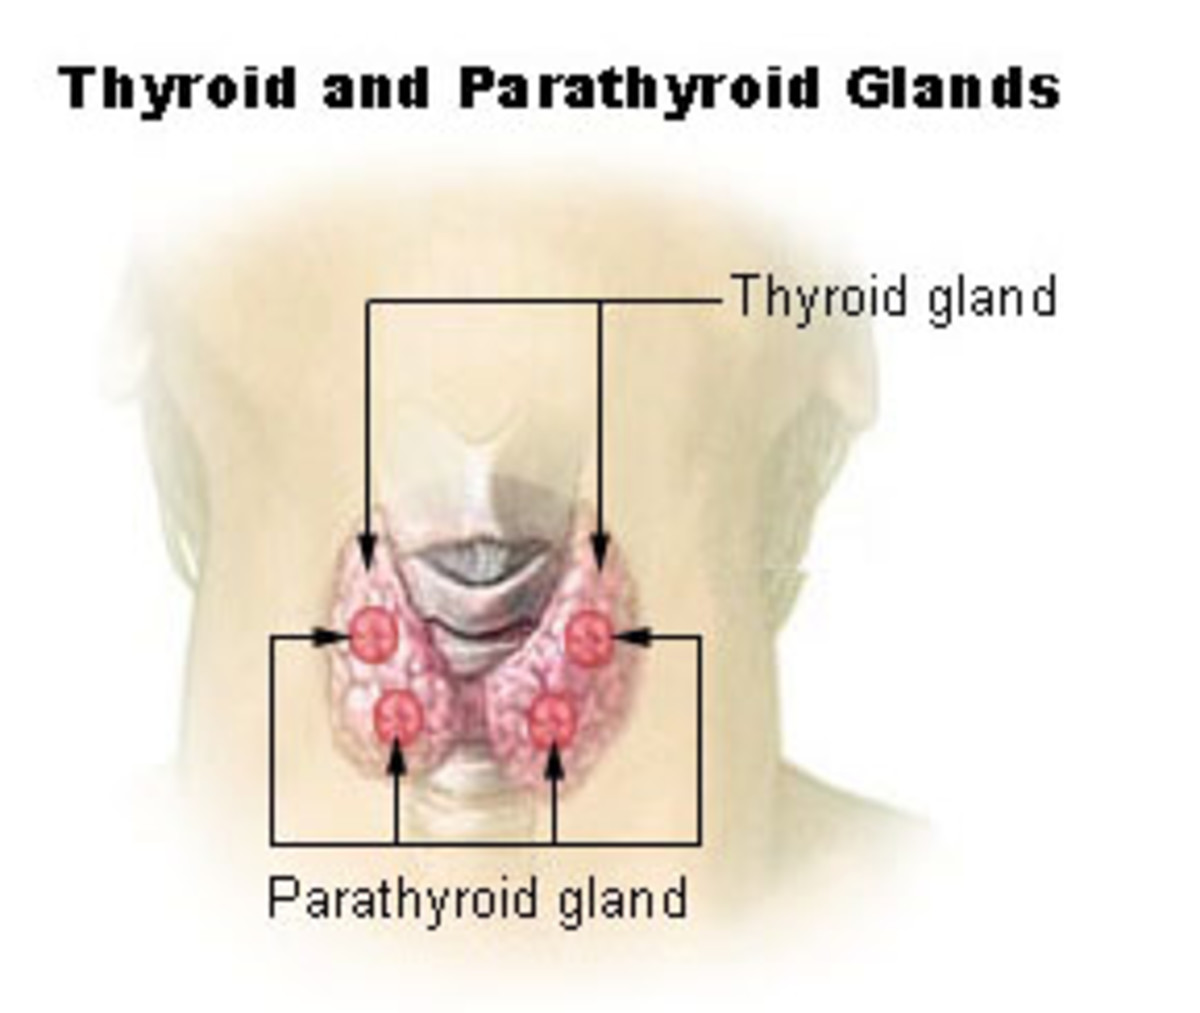 hyperthyroidism-hypothyroidism-succesful-alternative-healing